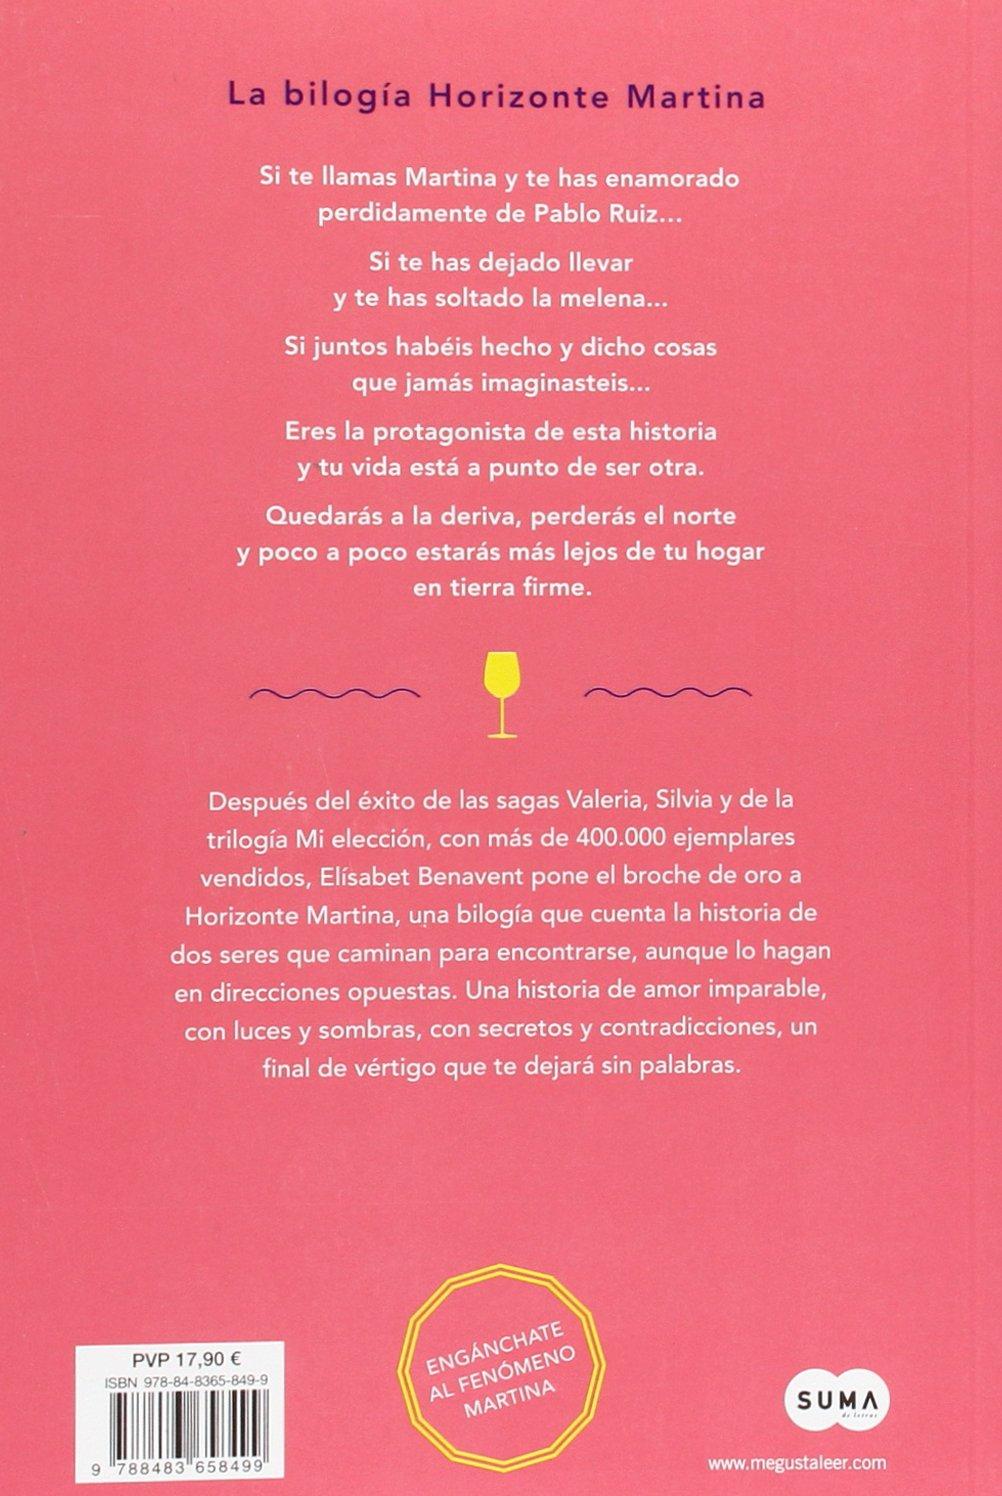 Martina en tierra firme (Horizonte Martina 2): Amazon.es: Benavent, Elísabet: Libros